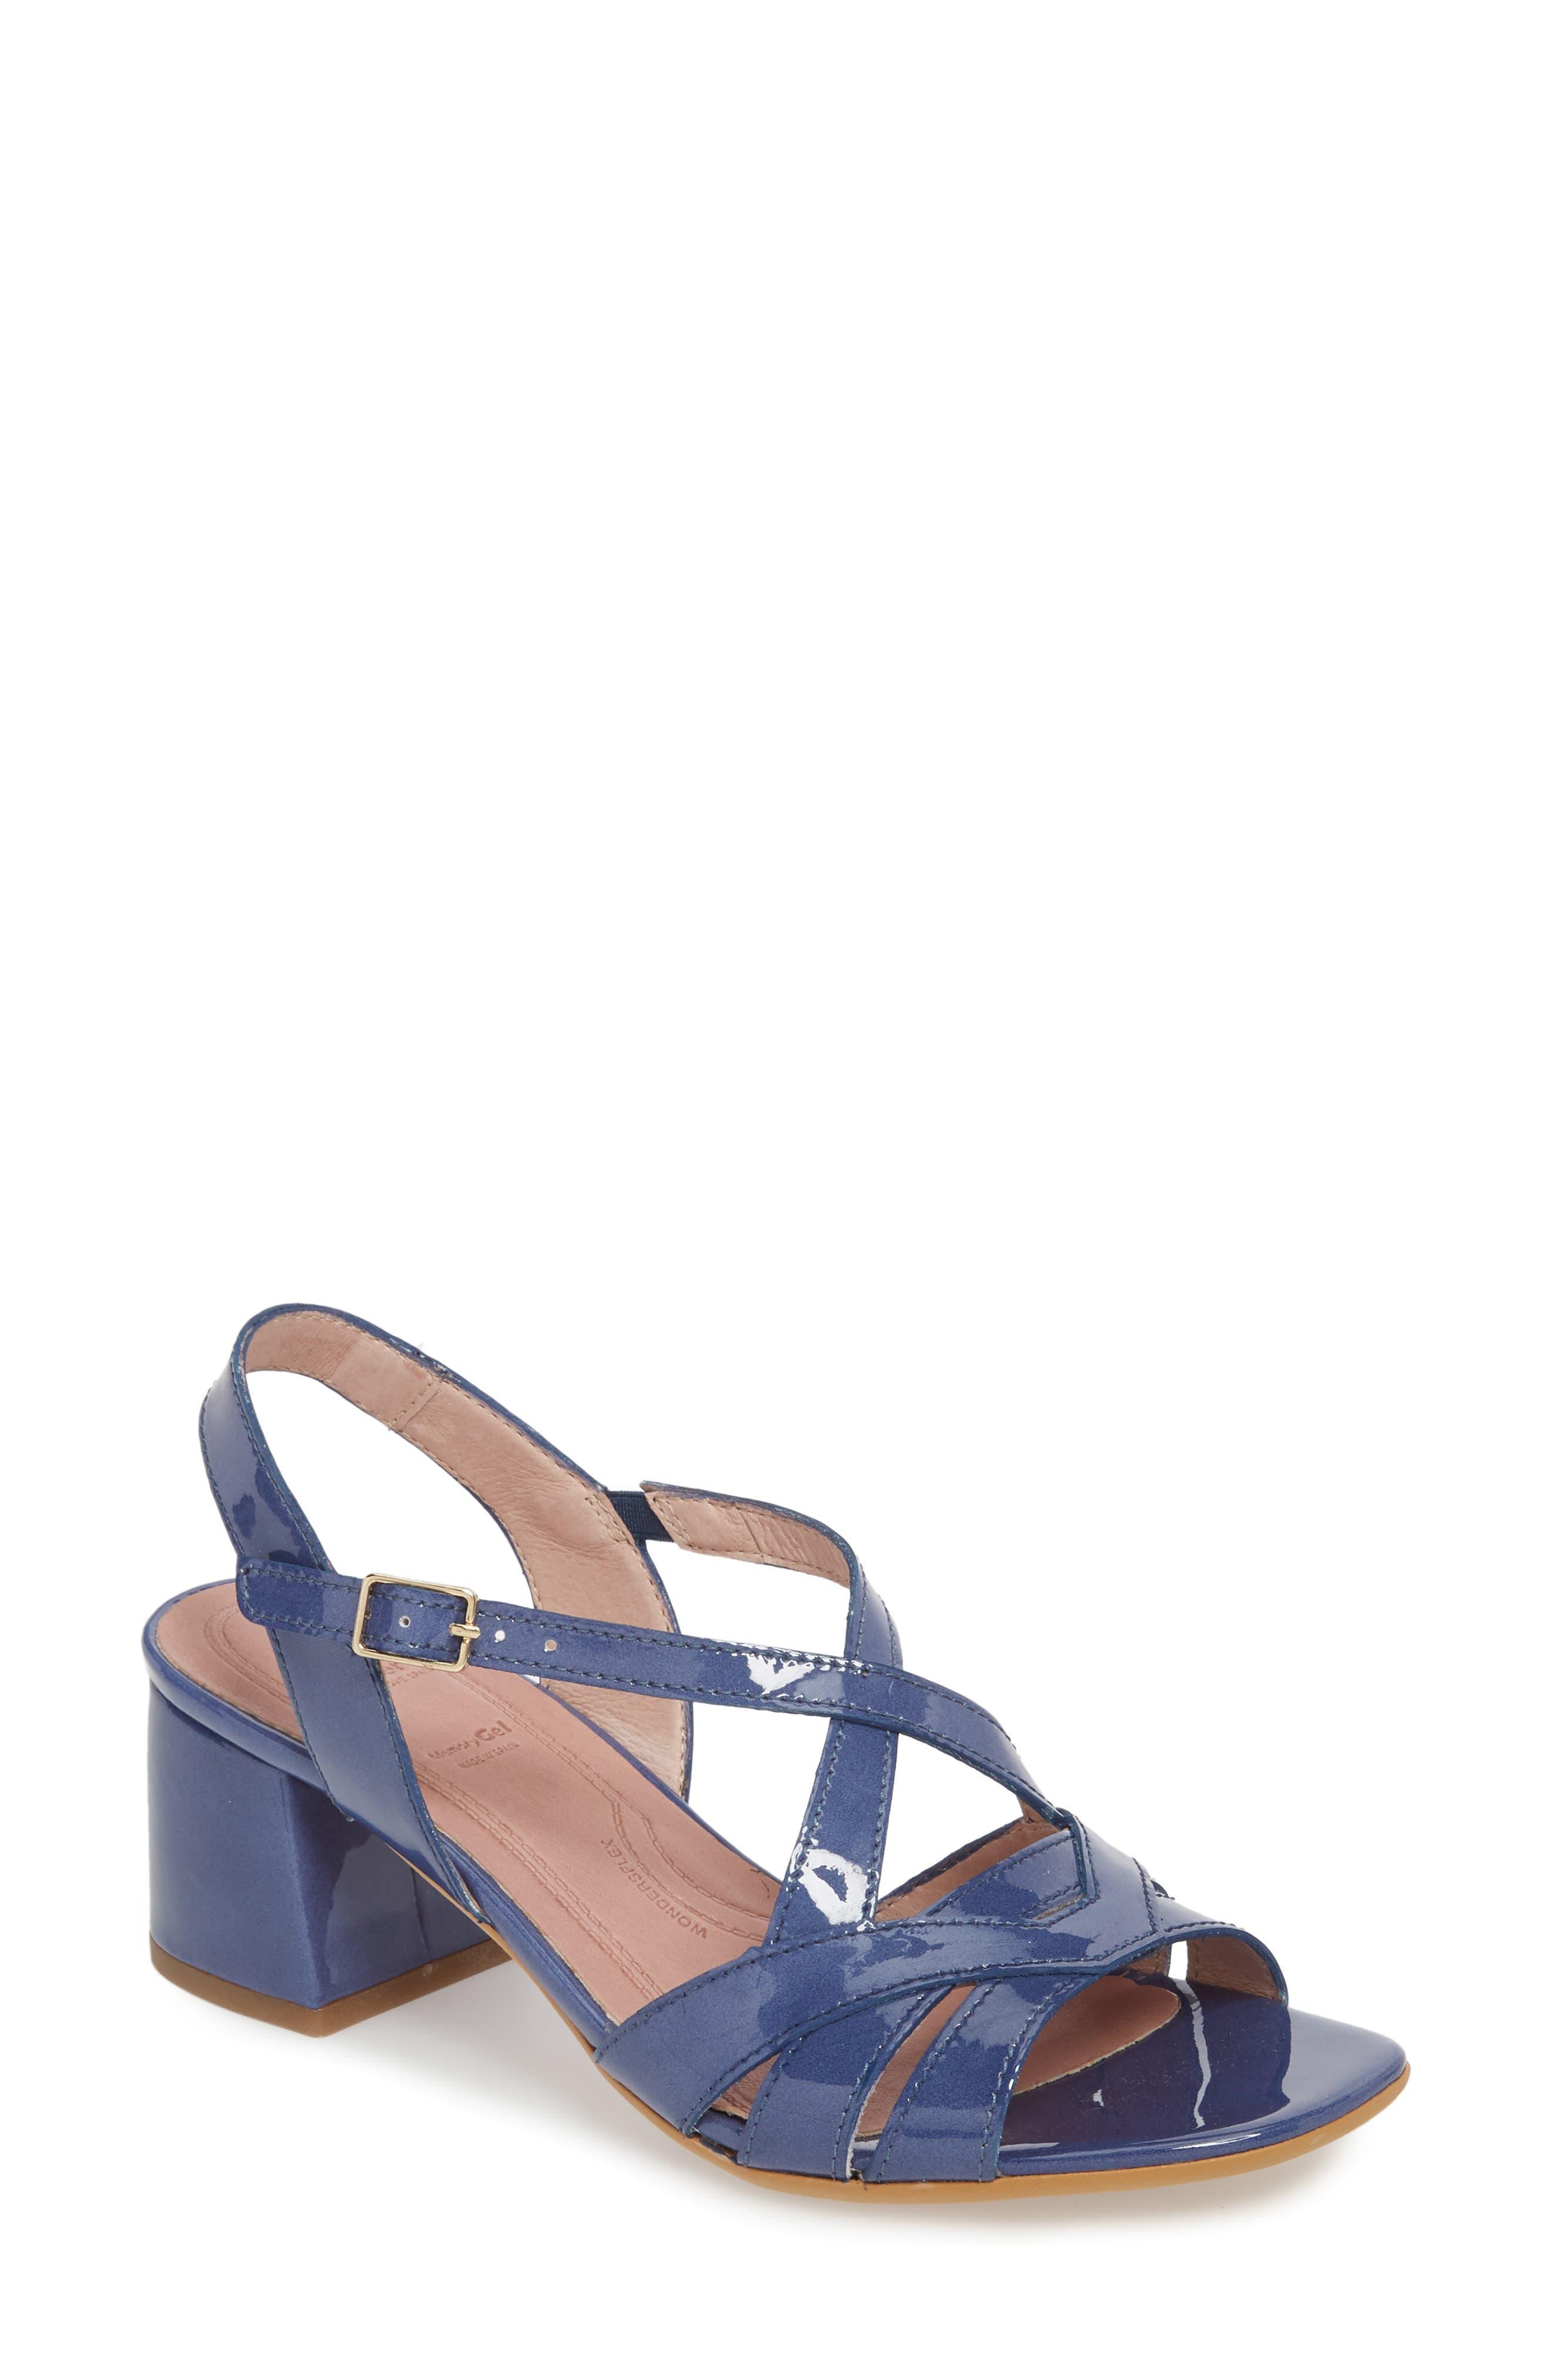 Block Heel Sandal,                         Main,                         color, Jean Patent Leather